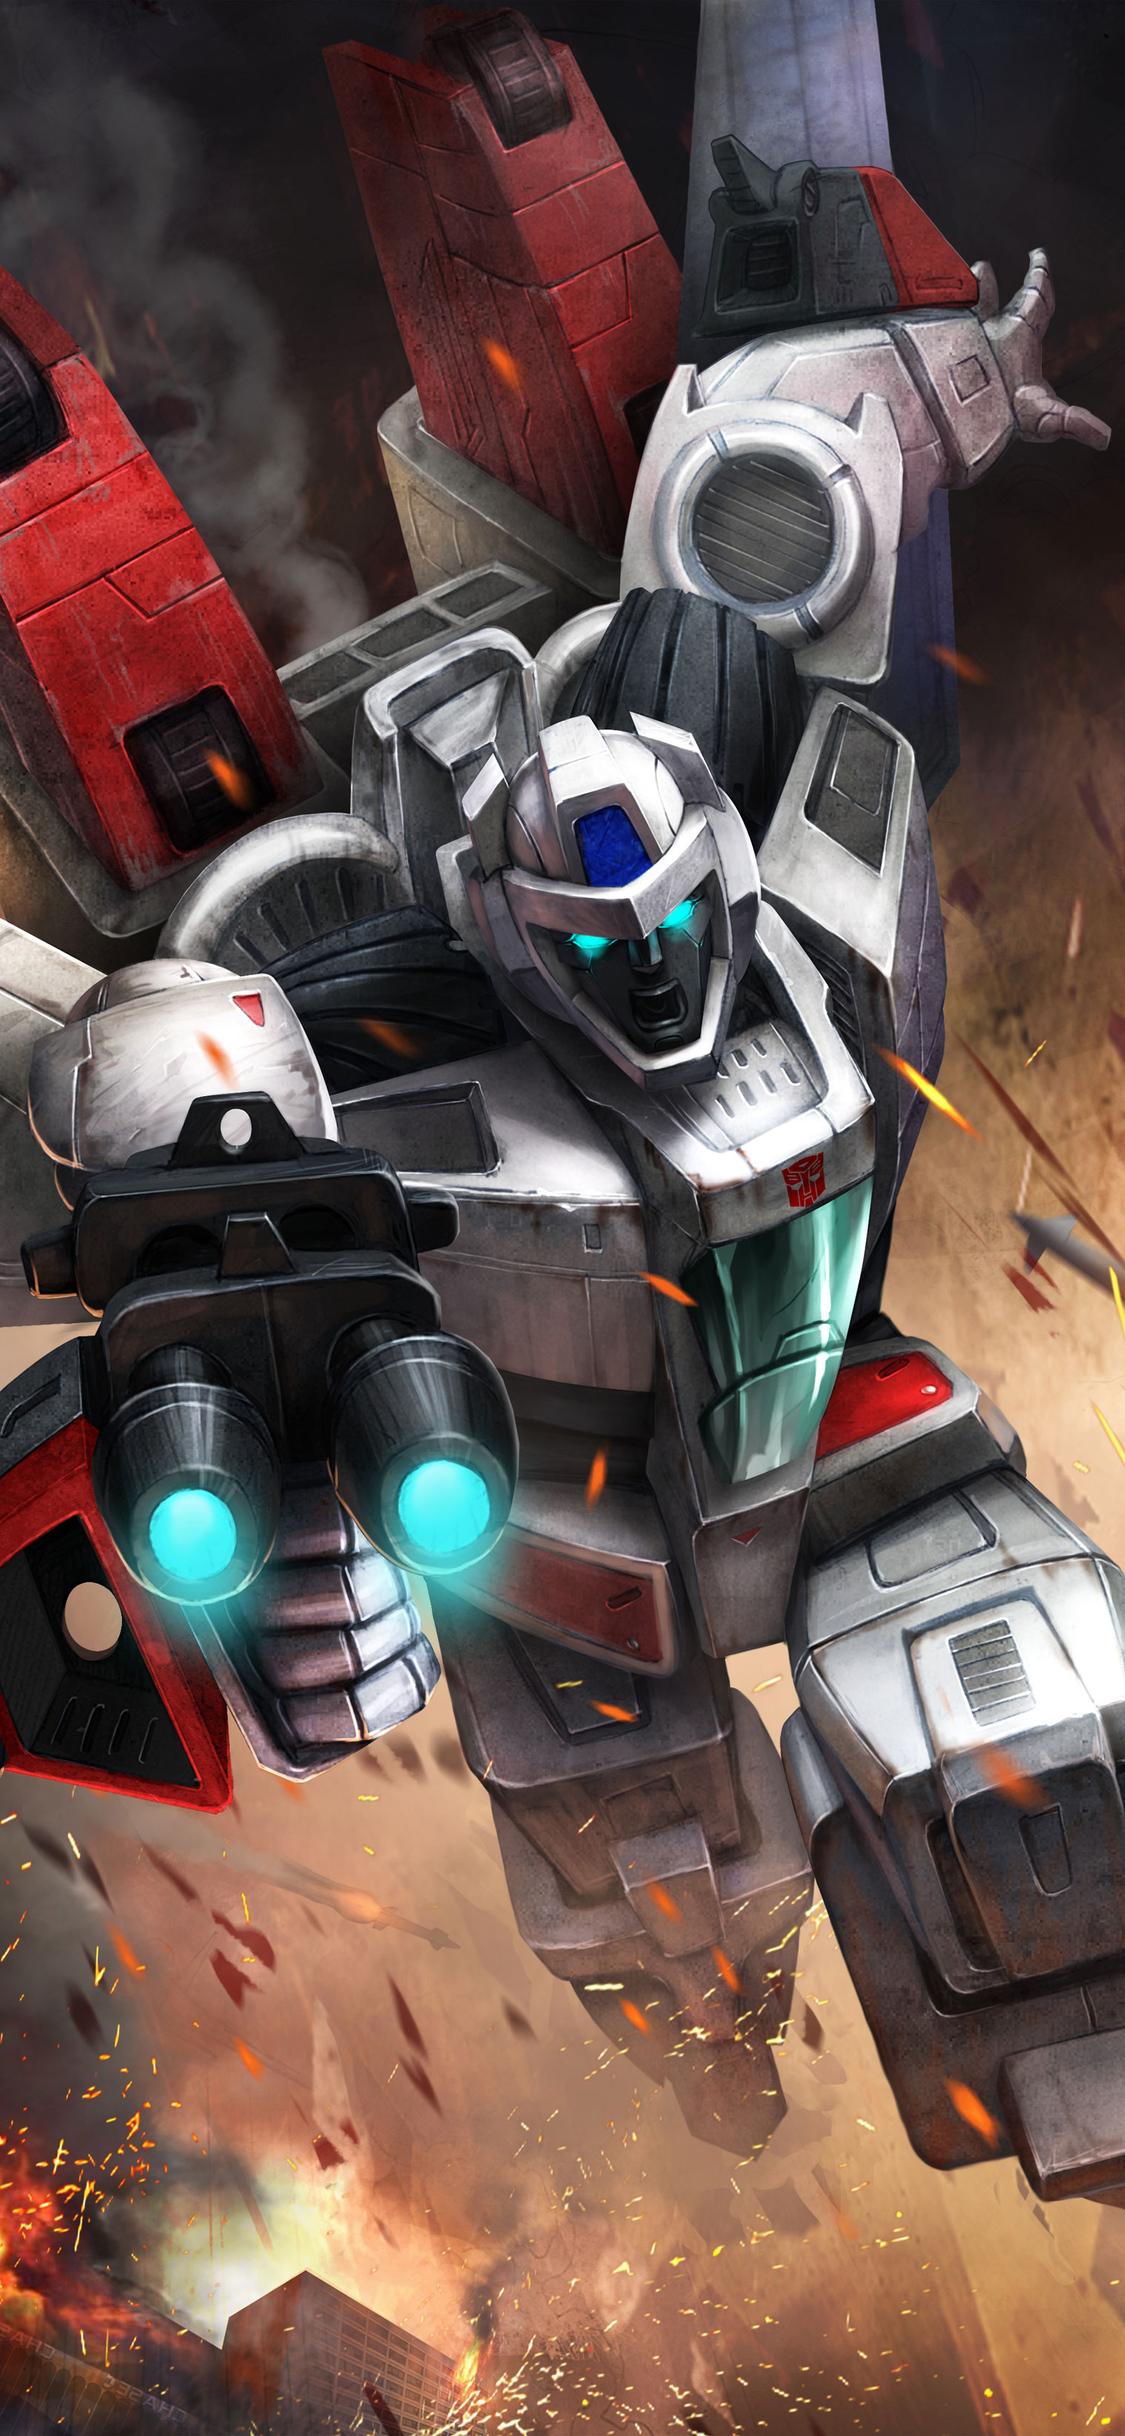 1125x2436 Autobots Transformers Hd Iphone Xs Iphone 10